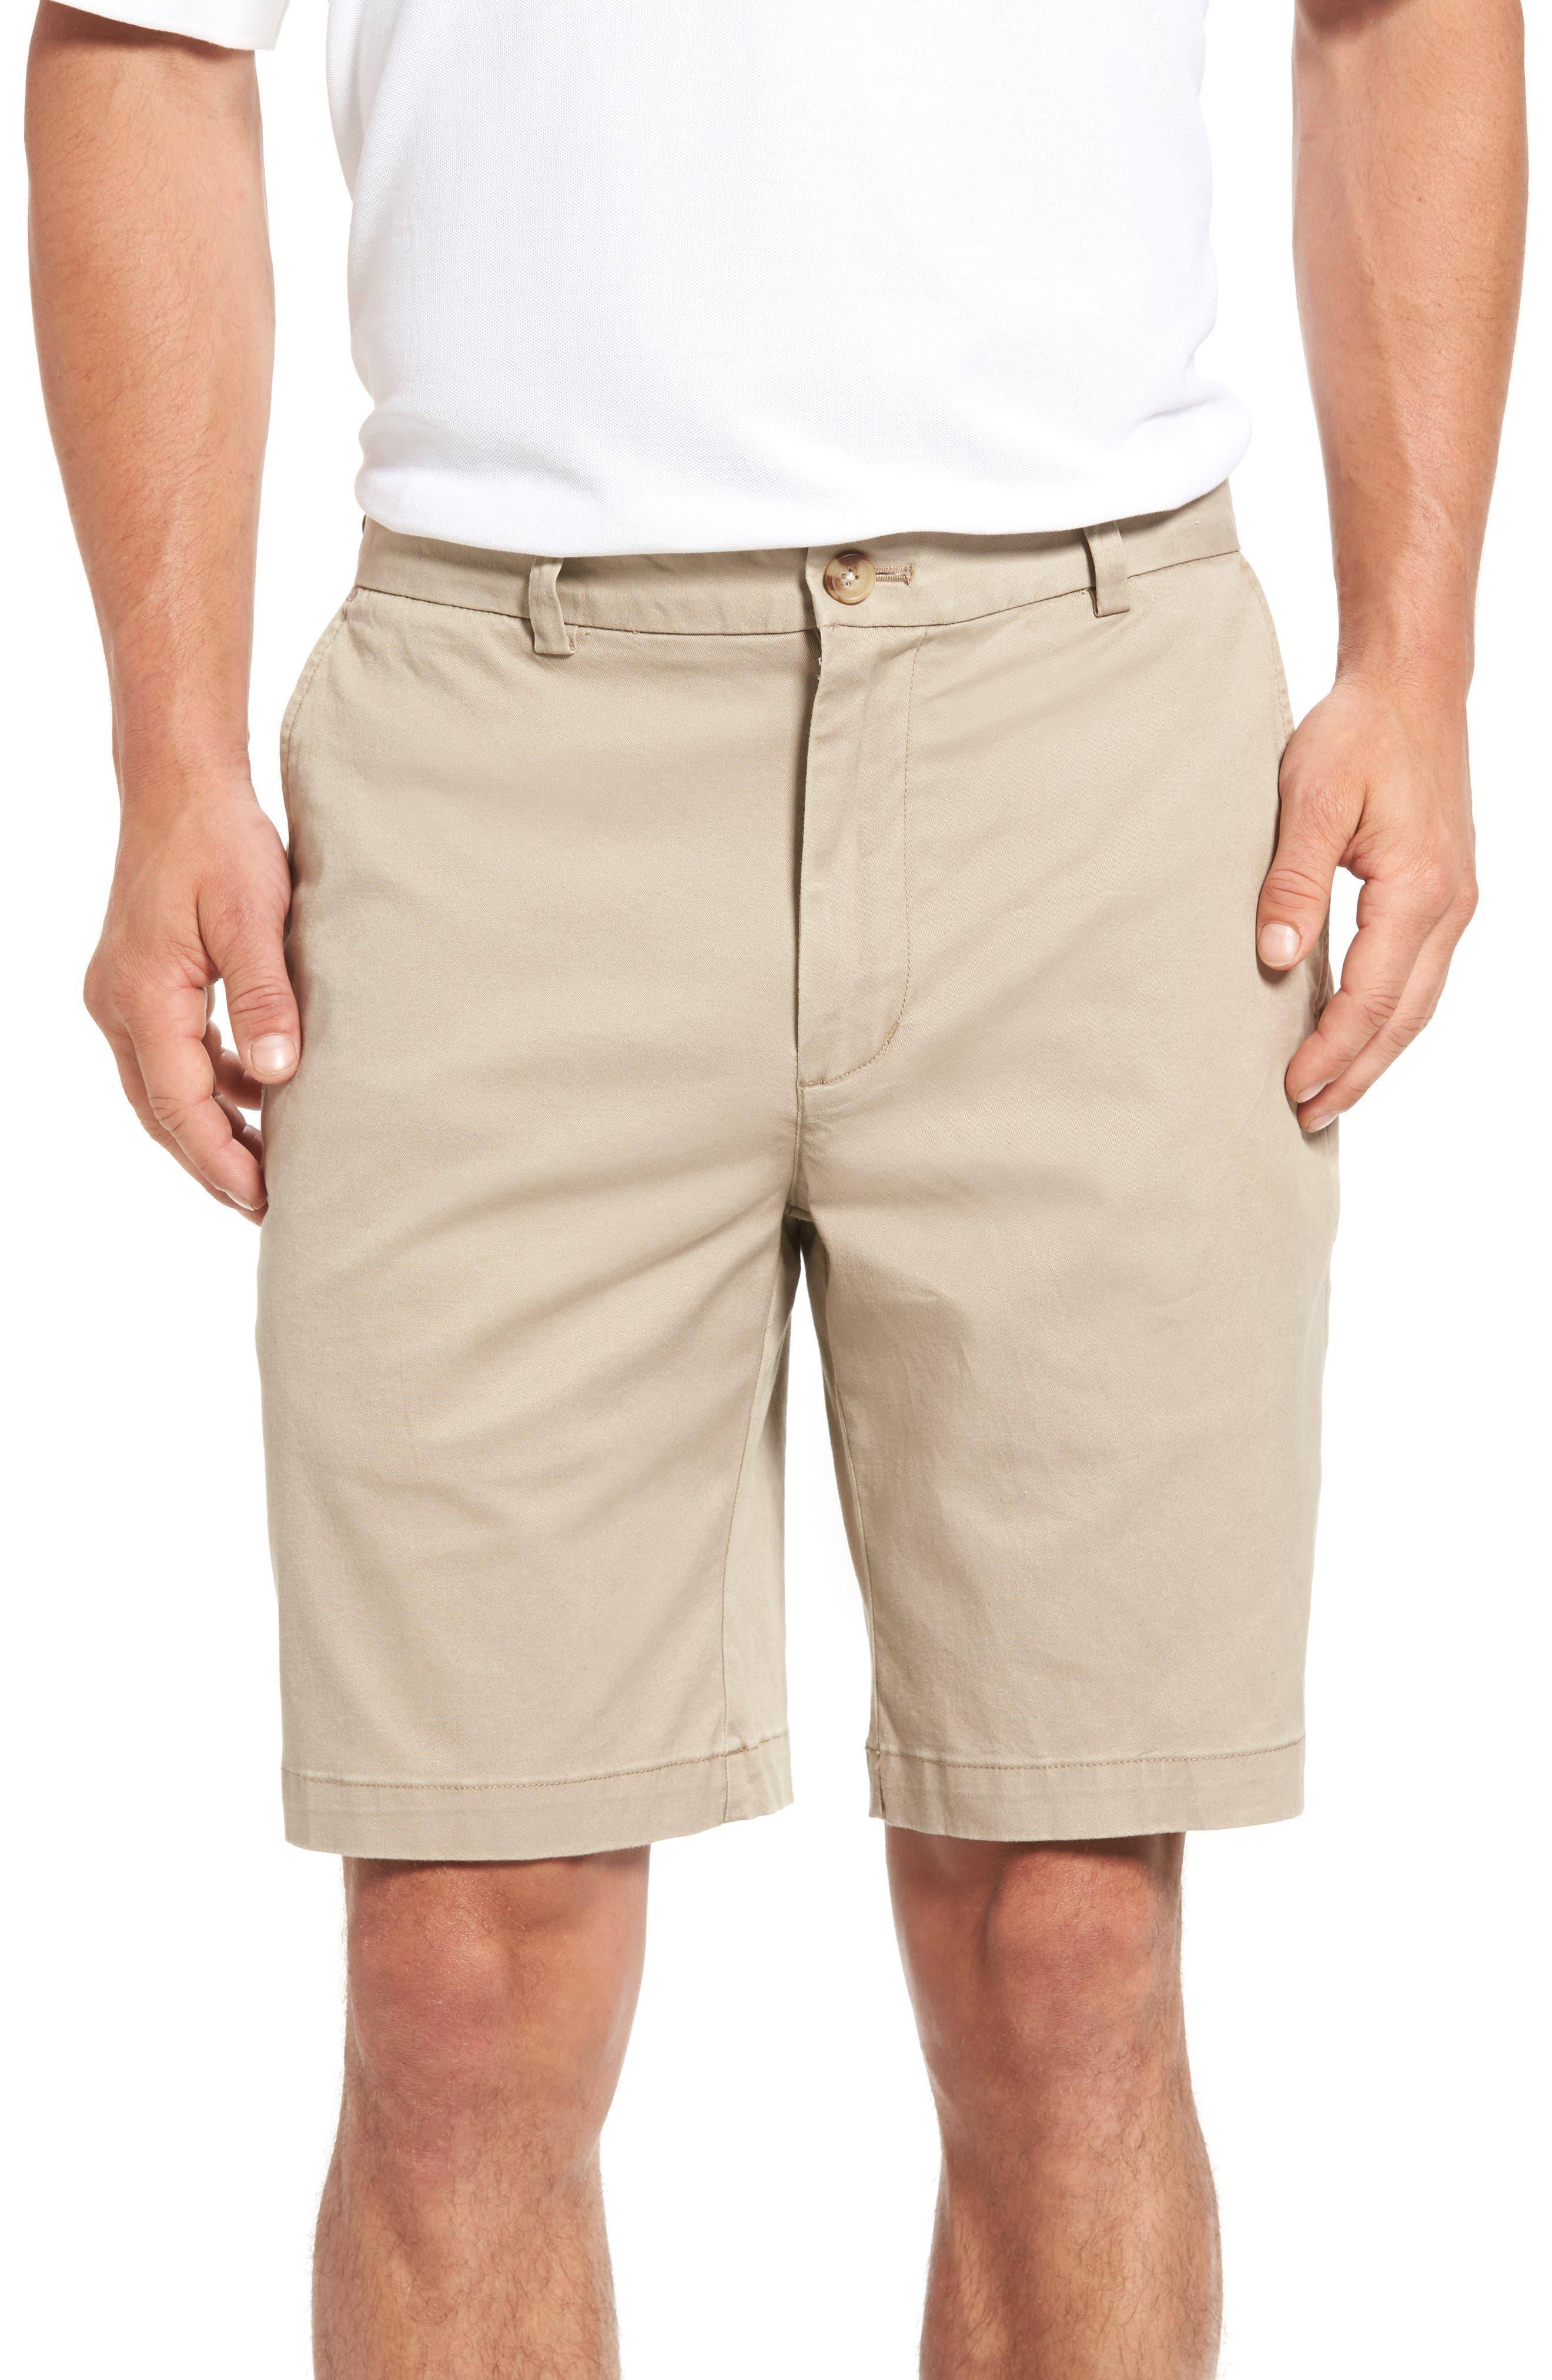 9 Inch Stretch Breaker Shorts,                             Main thumbnail 1, color,                             Khaki